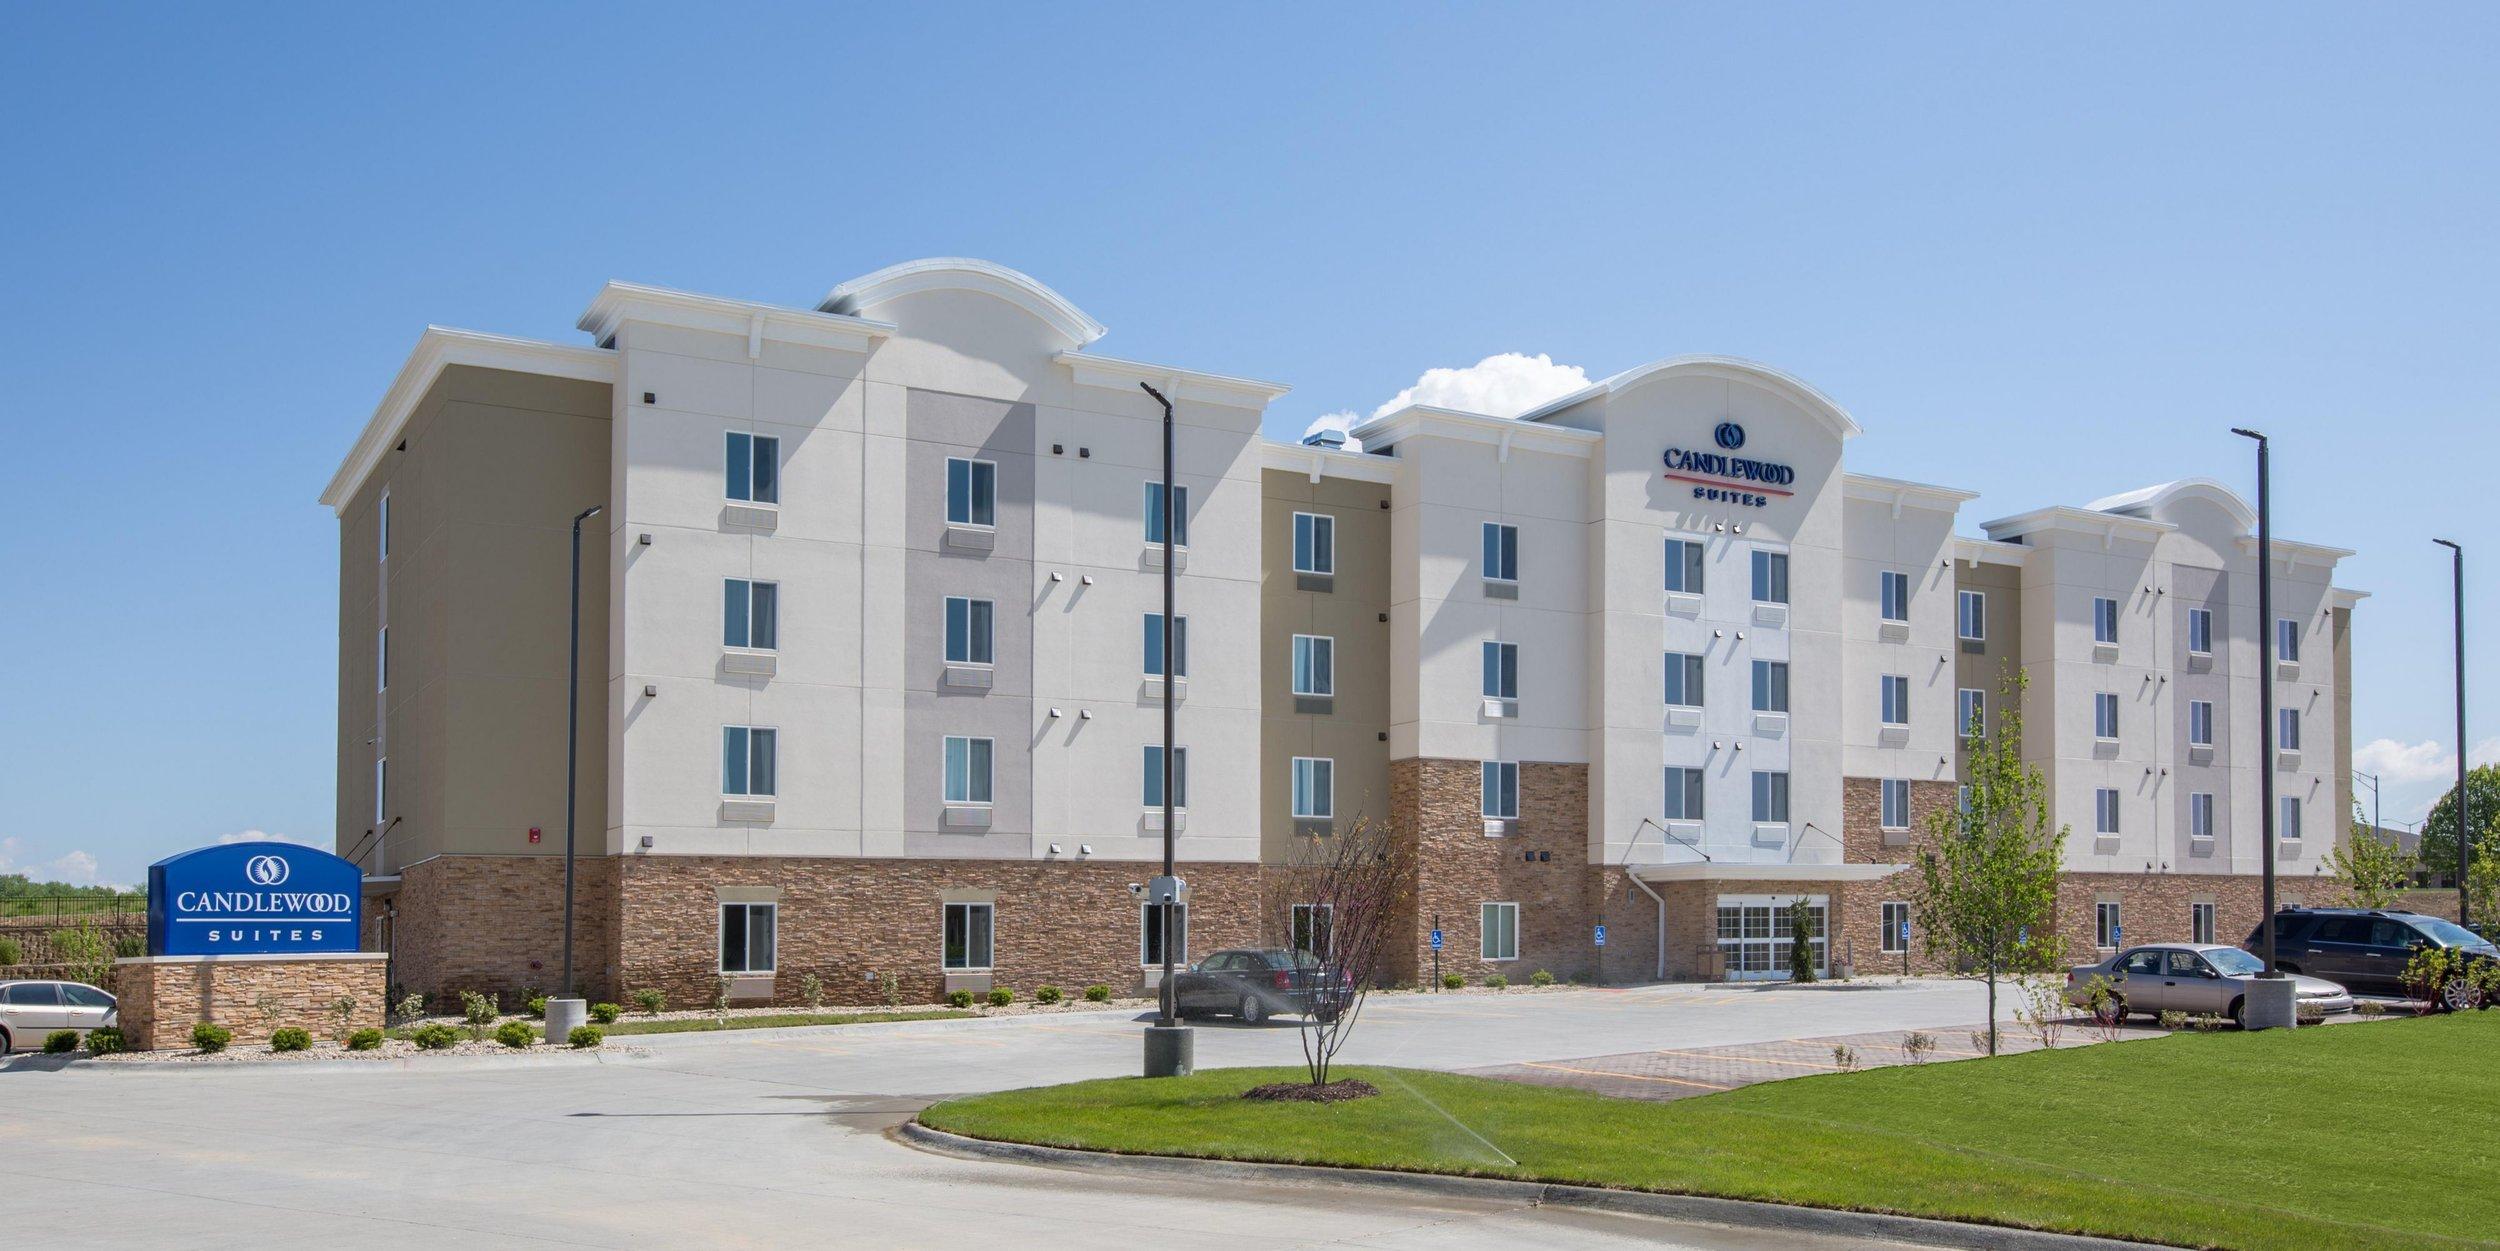 candlewood-suites-omaha-5073862889-2x1.jpg